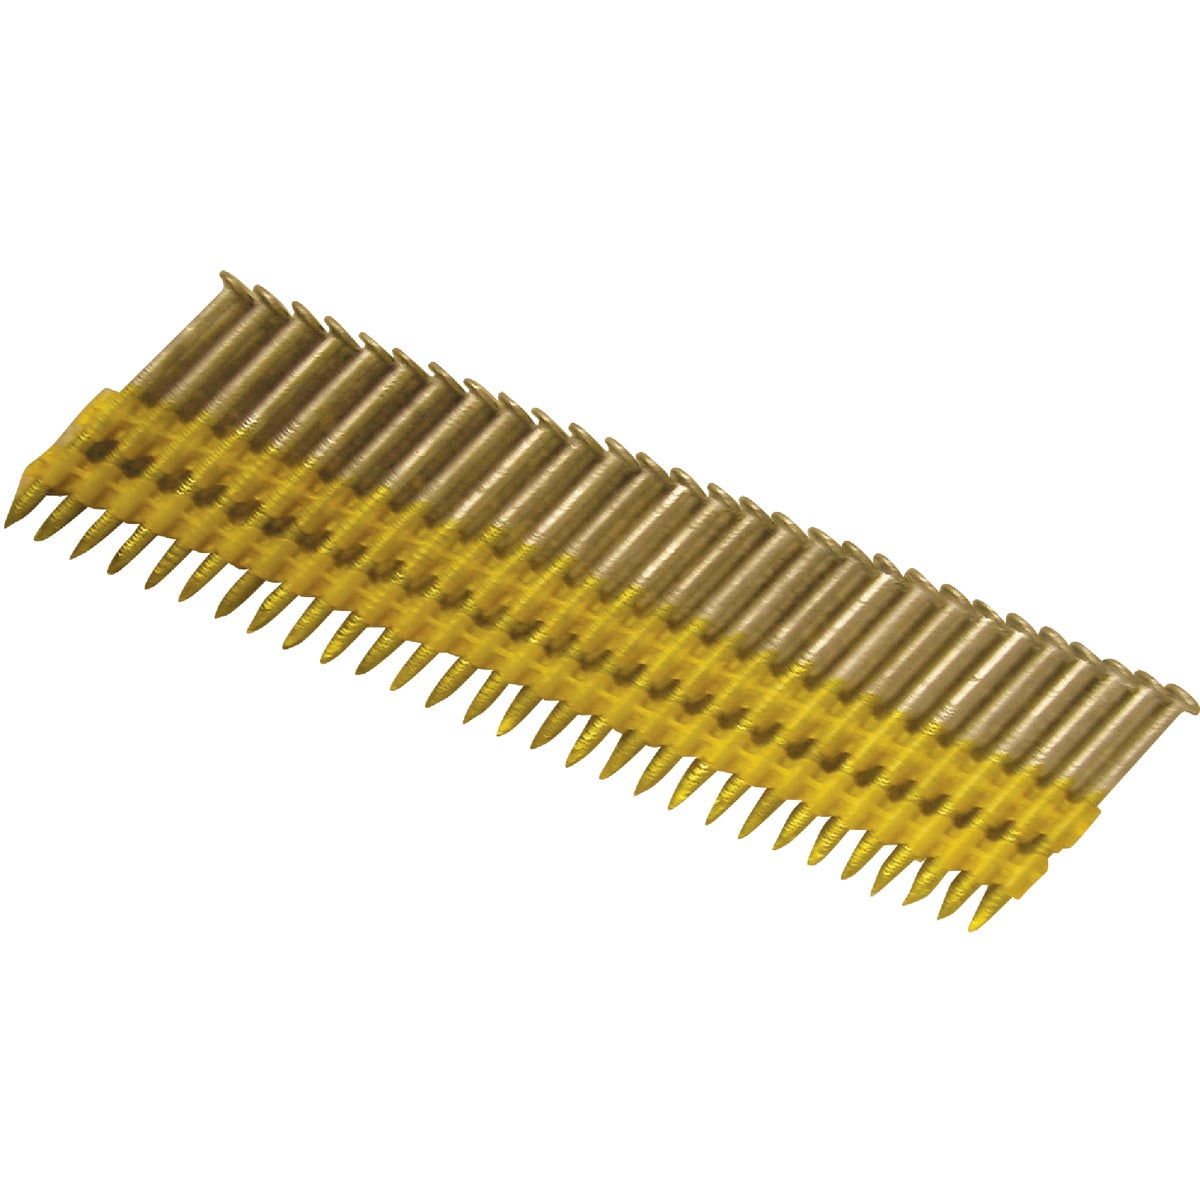 "1-7/8""X.092 HG STCK NAIL - GR150HG by Prime Source Pneumat"